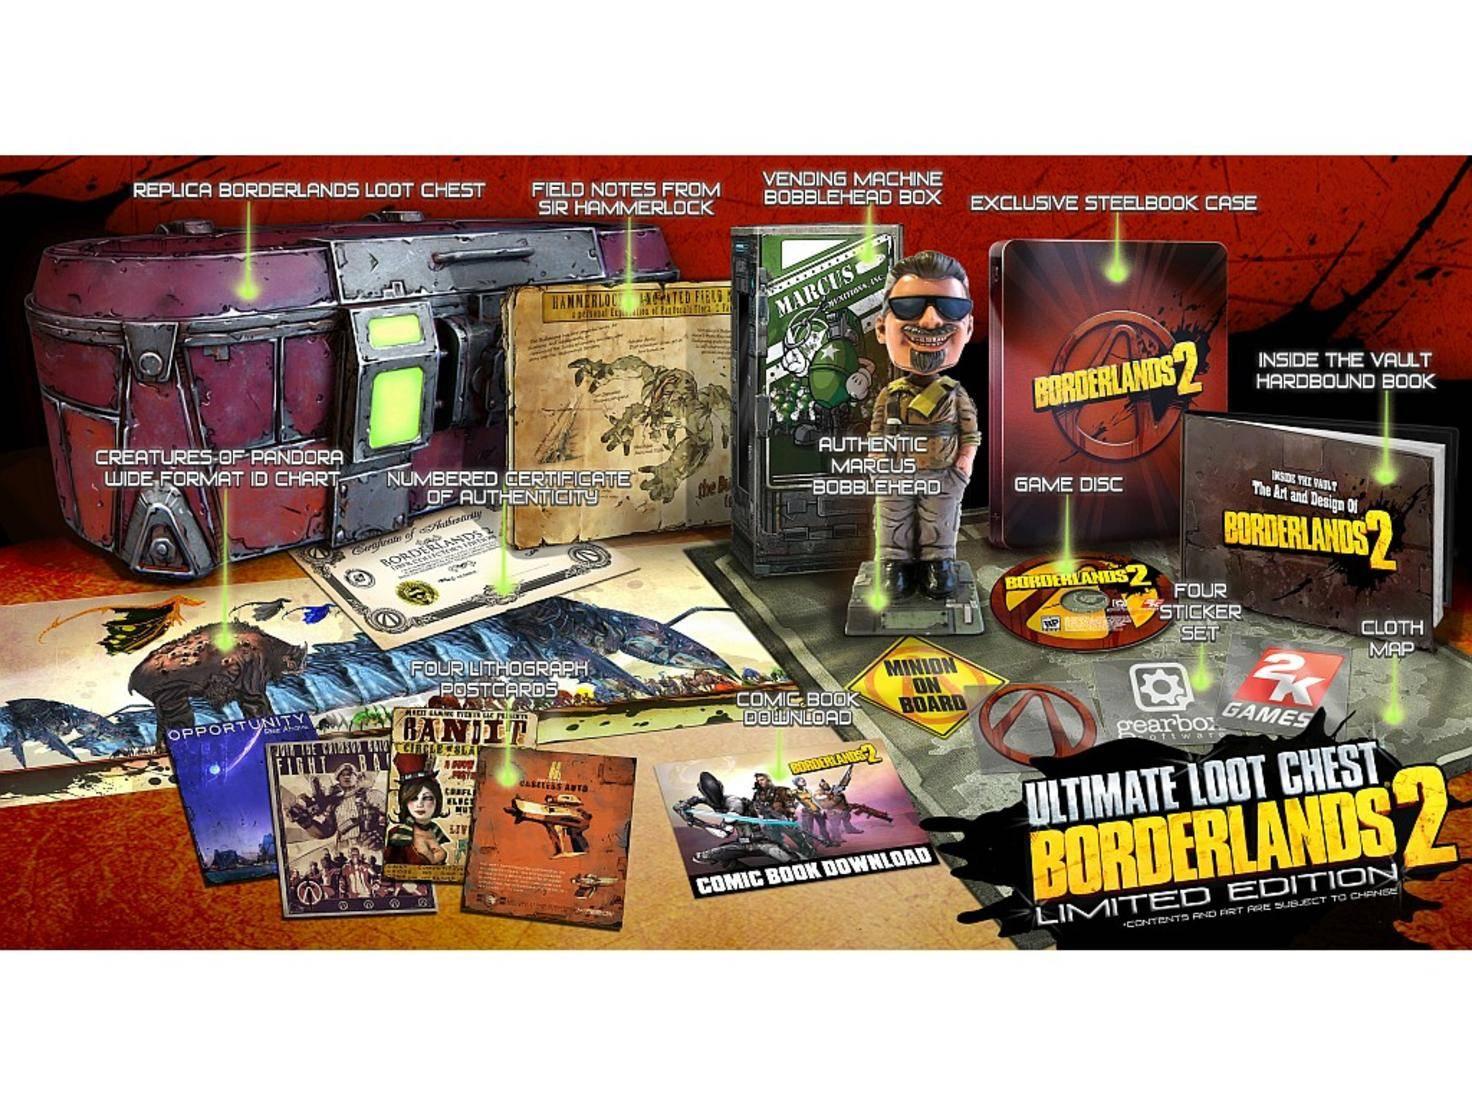 Borderlands_2_UltimateLootChest.jpg